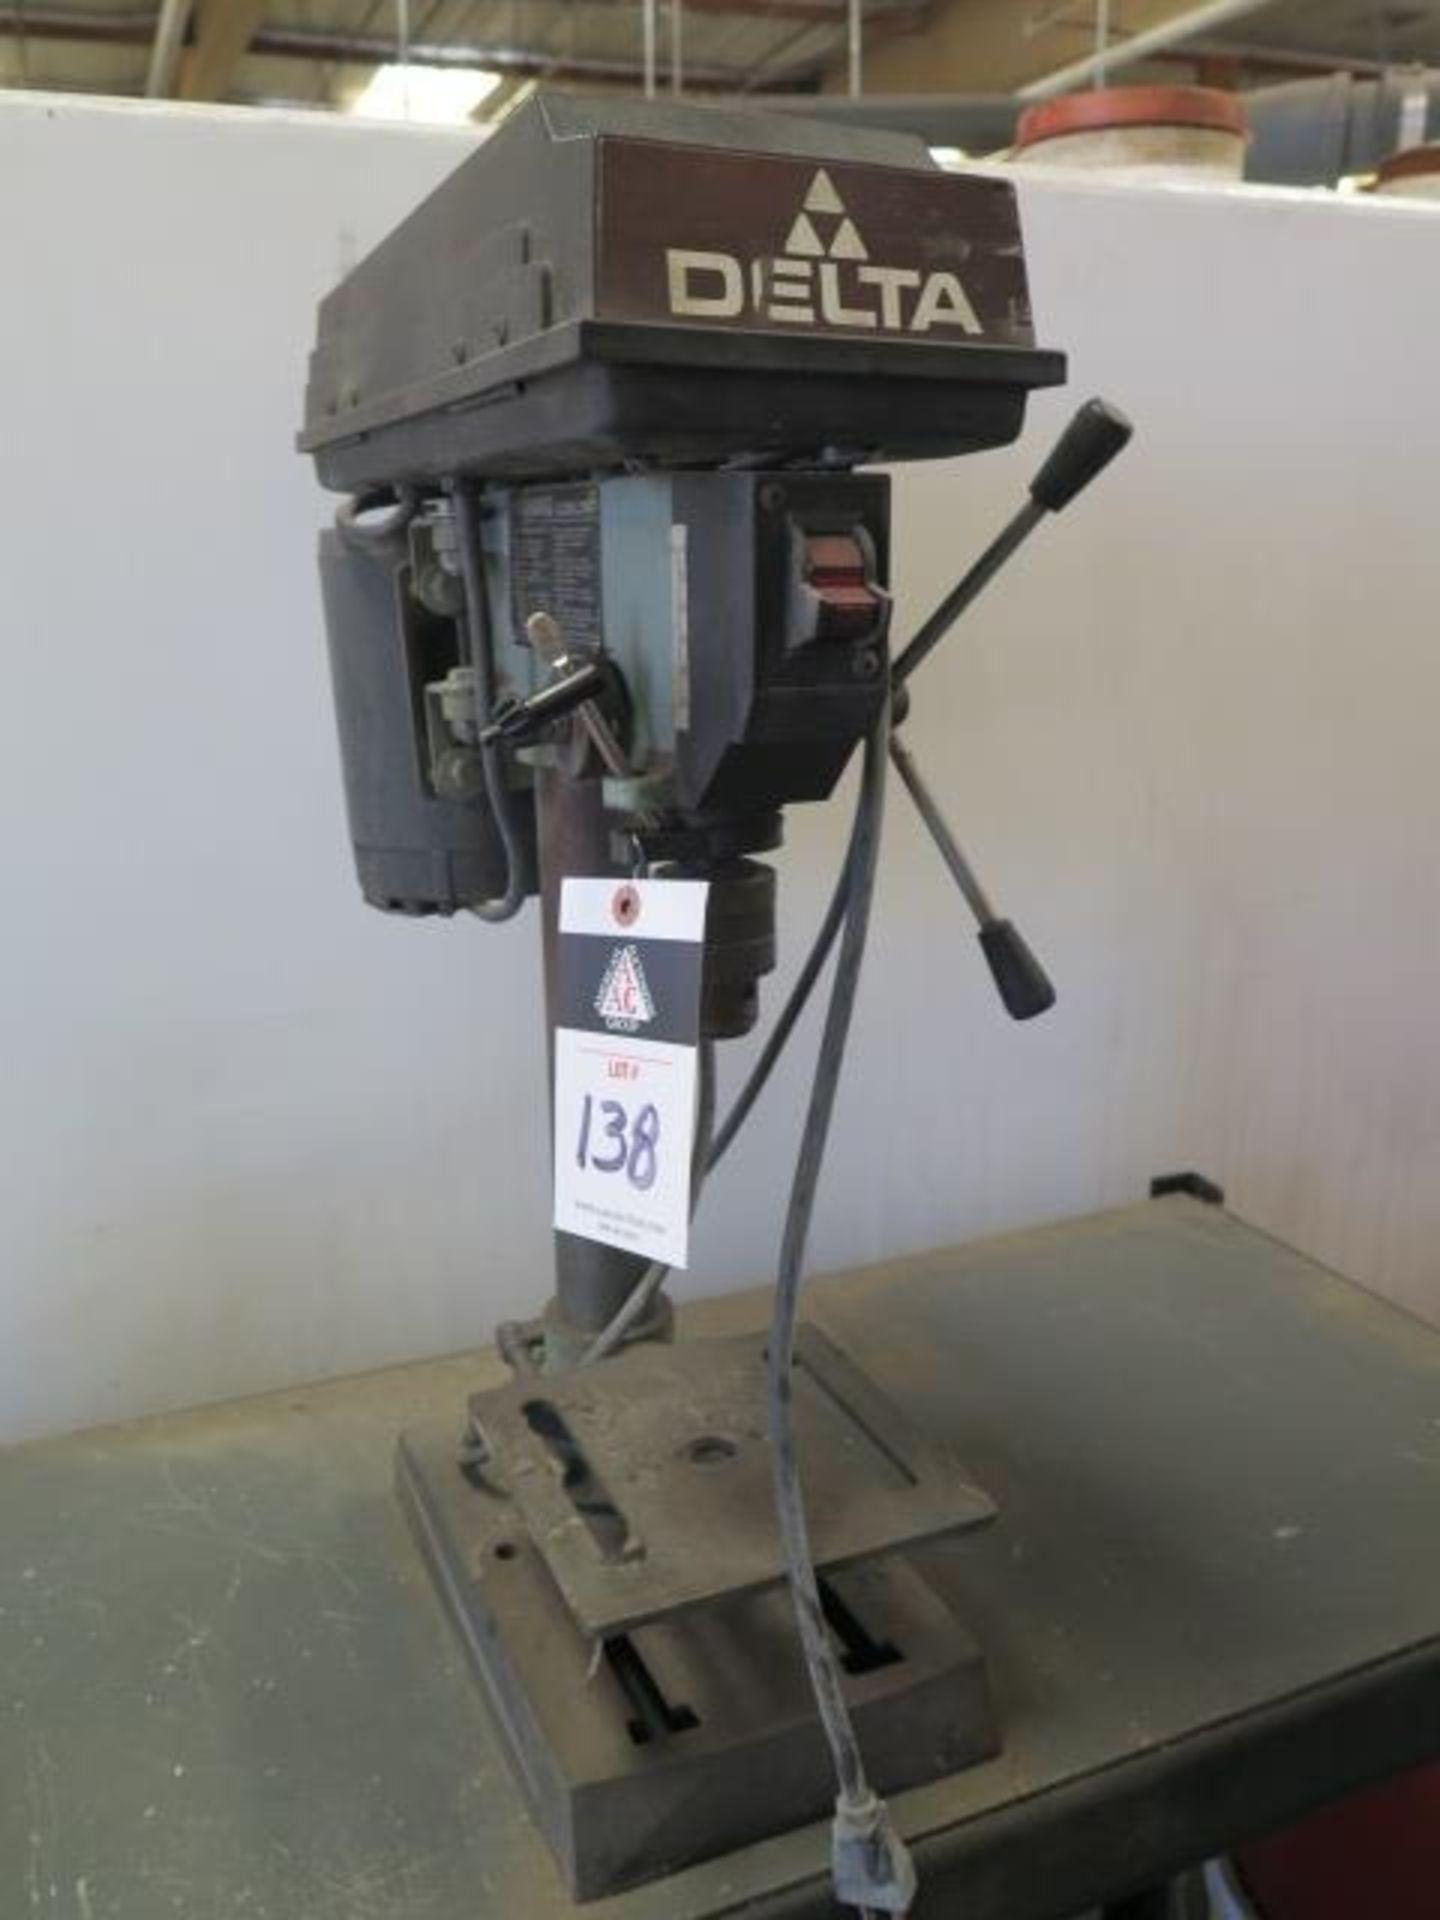 Delta Table Model Drill Press (SOLD AS-IS - NO WARRANTY)